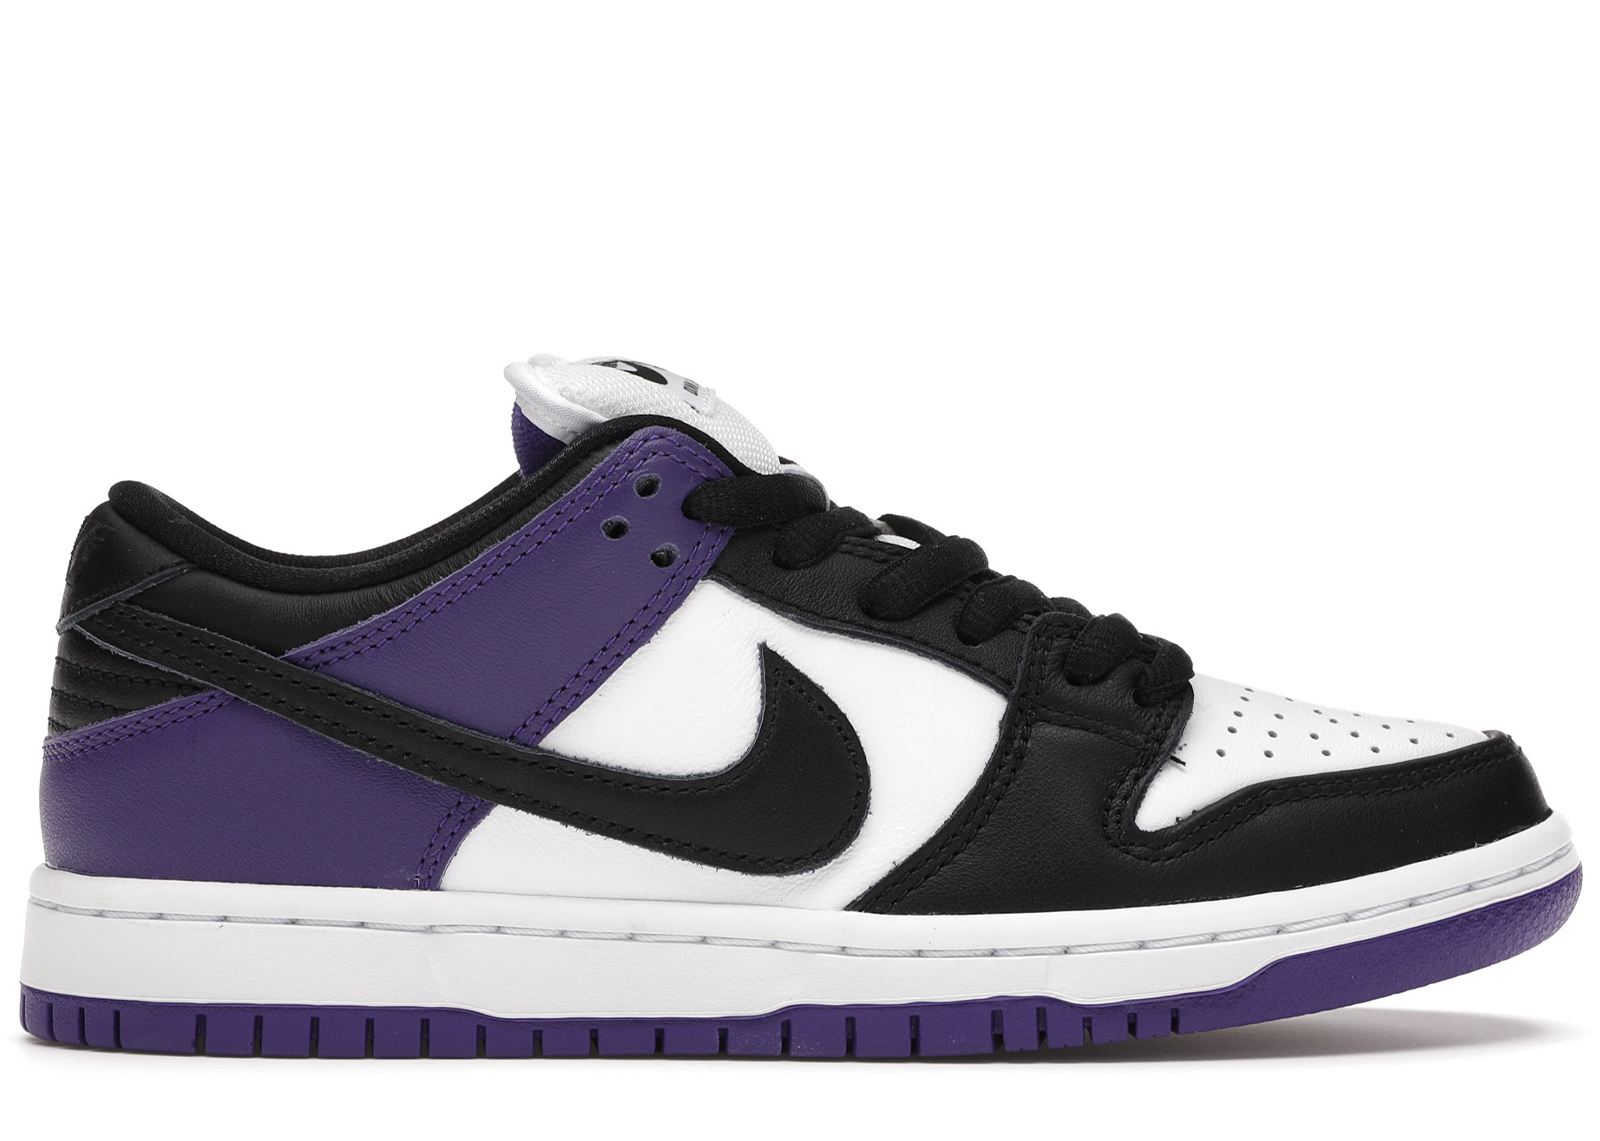 Nike SB Dunk Low Court Purple - BQ6817-500